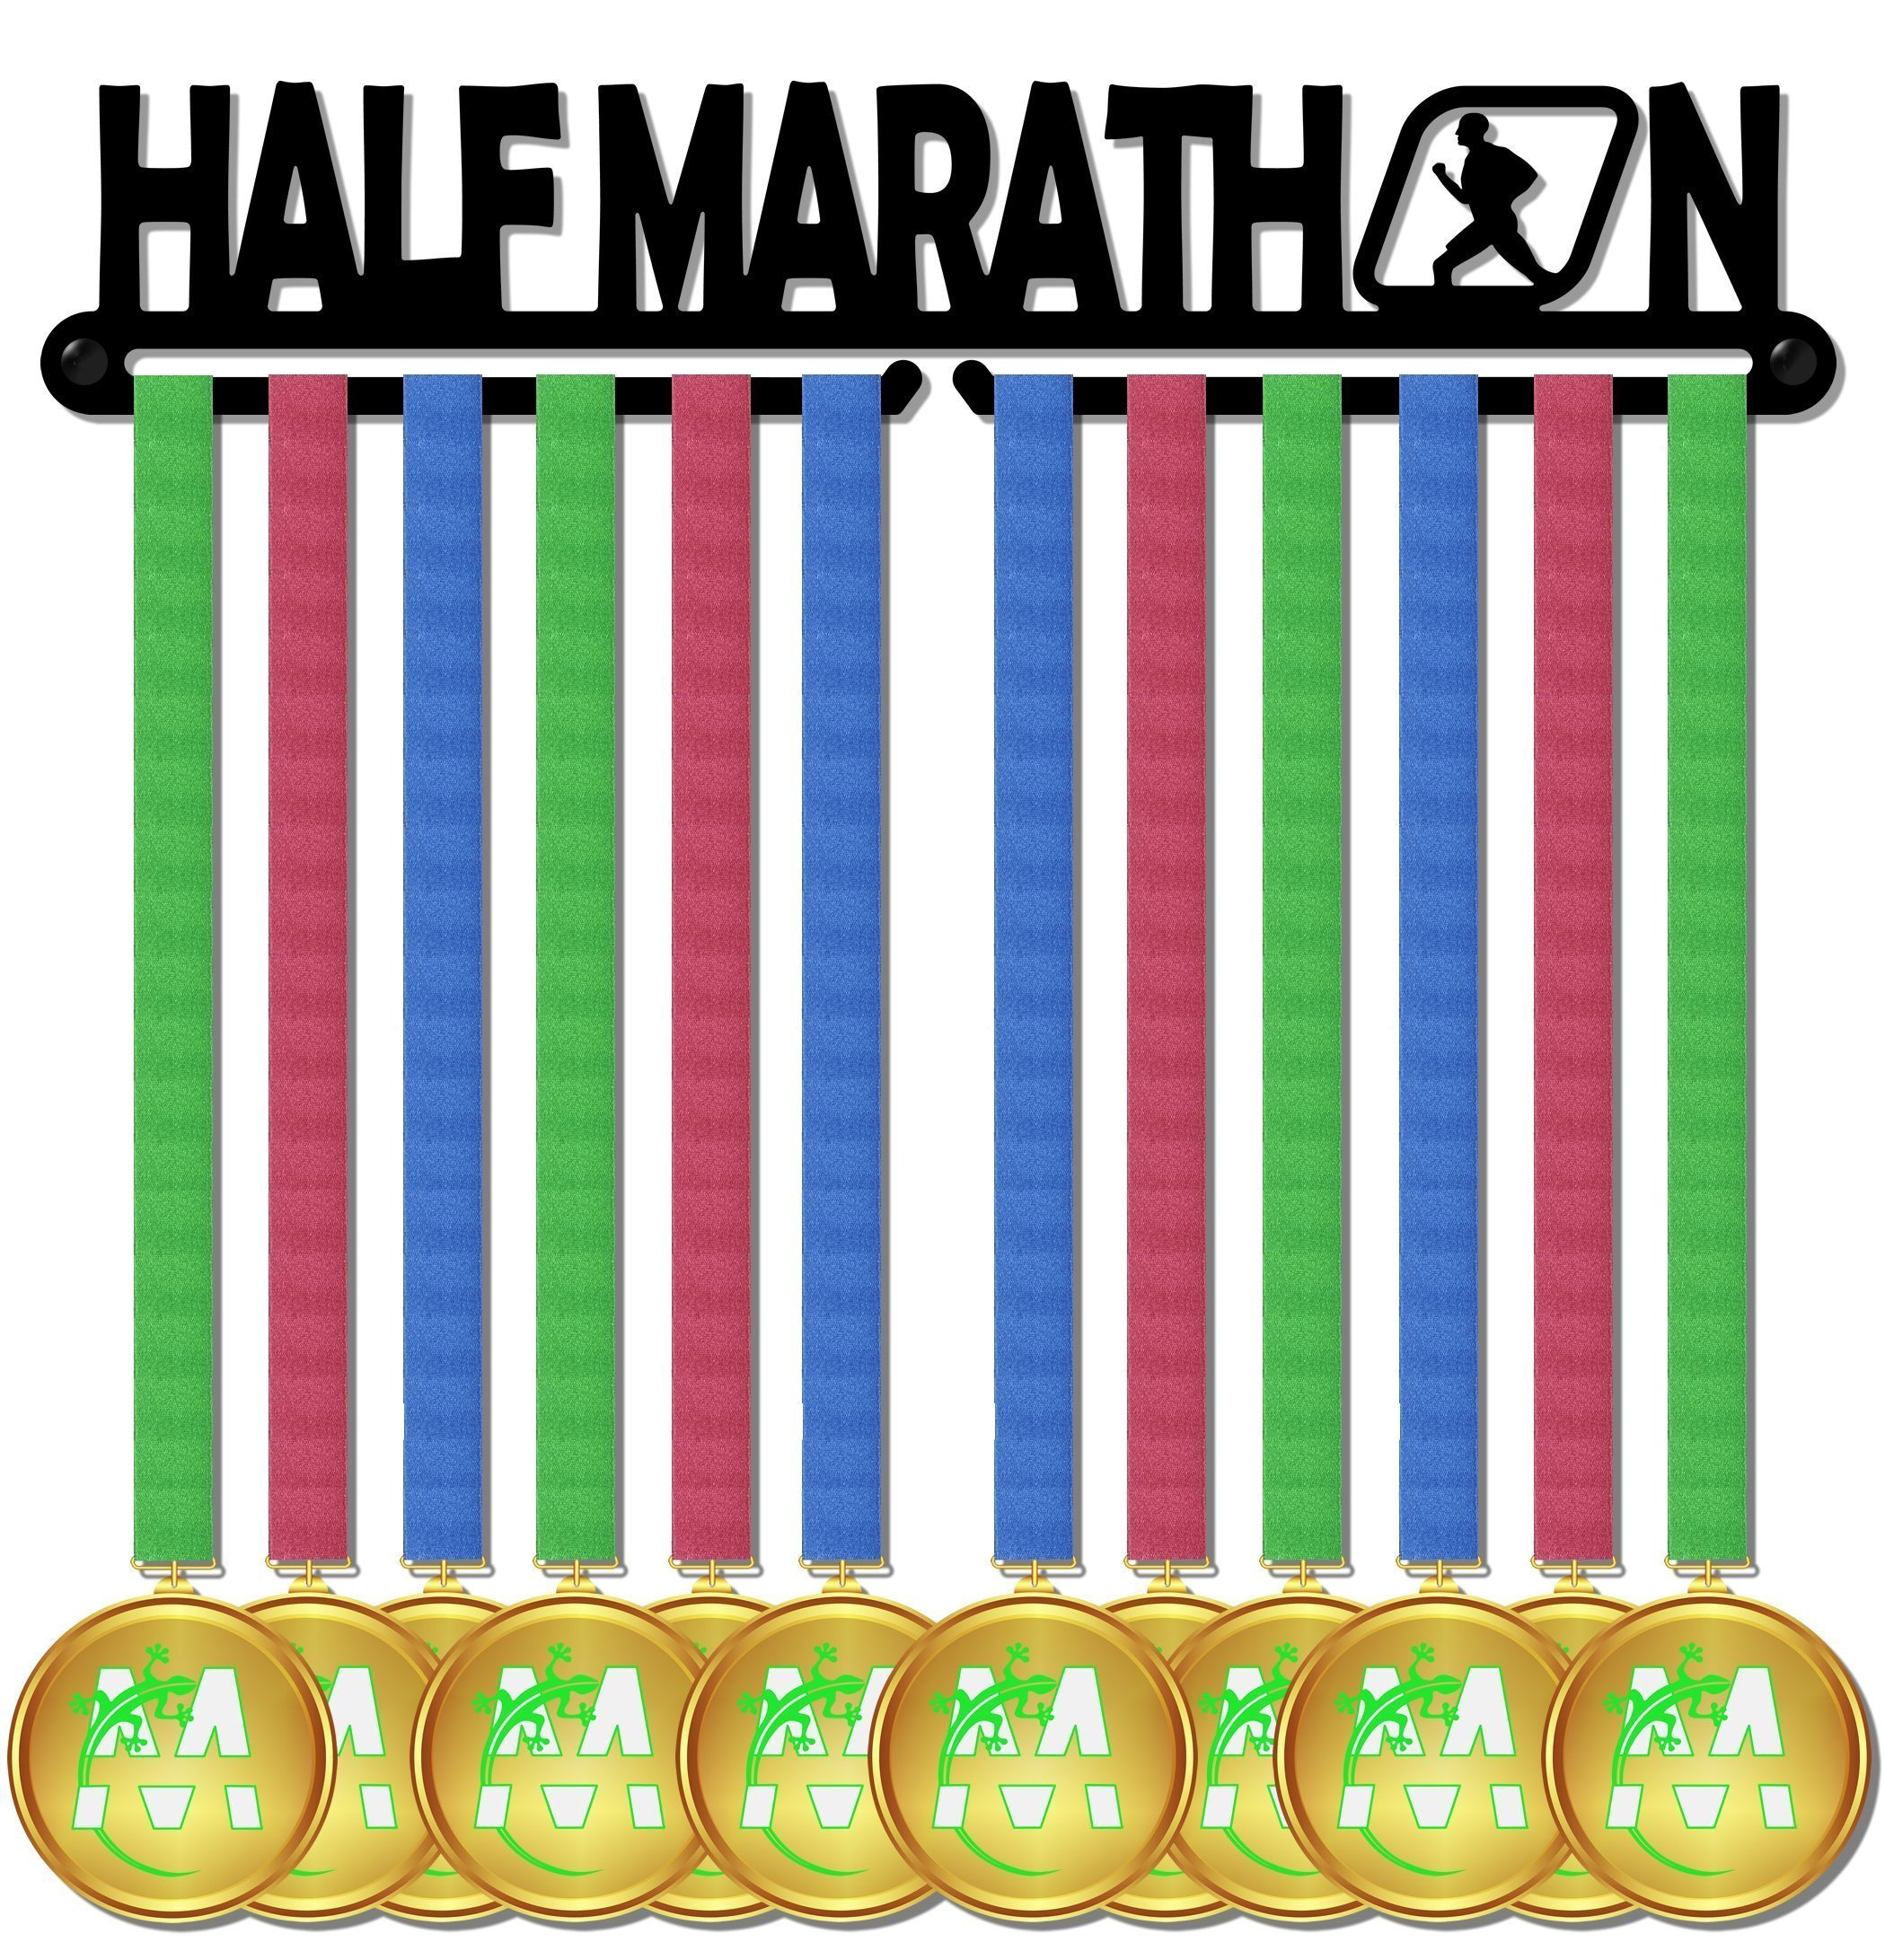 Medal Display medagliere da muro madal hanger half marathon design